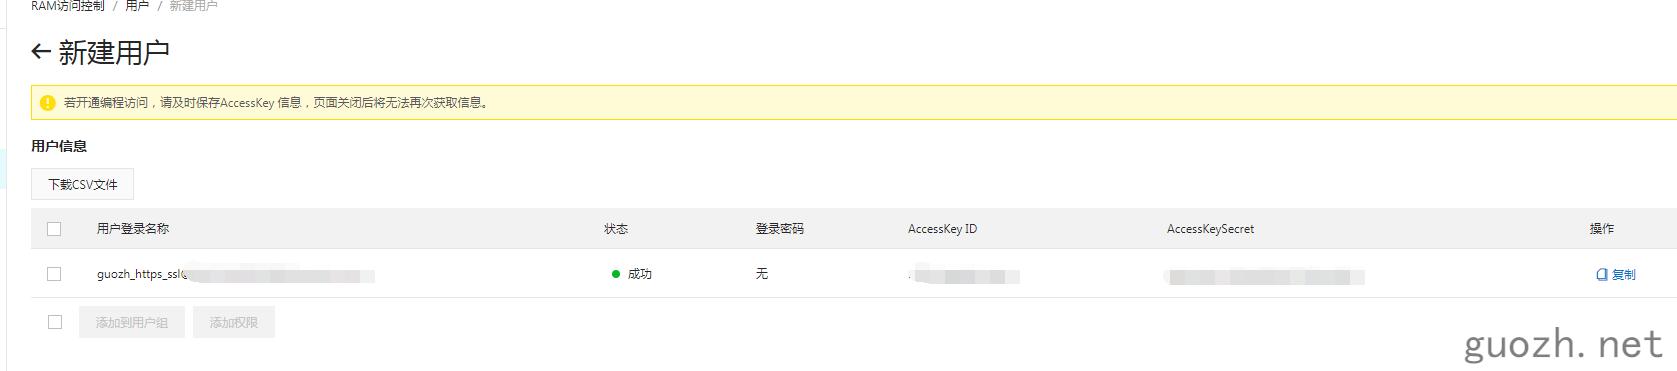 《Let's Encrypt泛域名证书生成 acme.sh免费申请使用配置 地表最强教程》